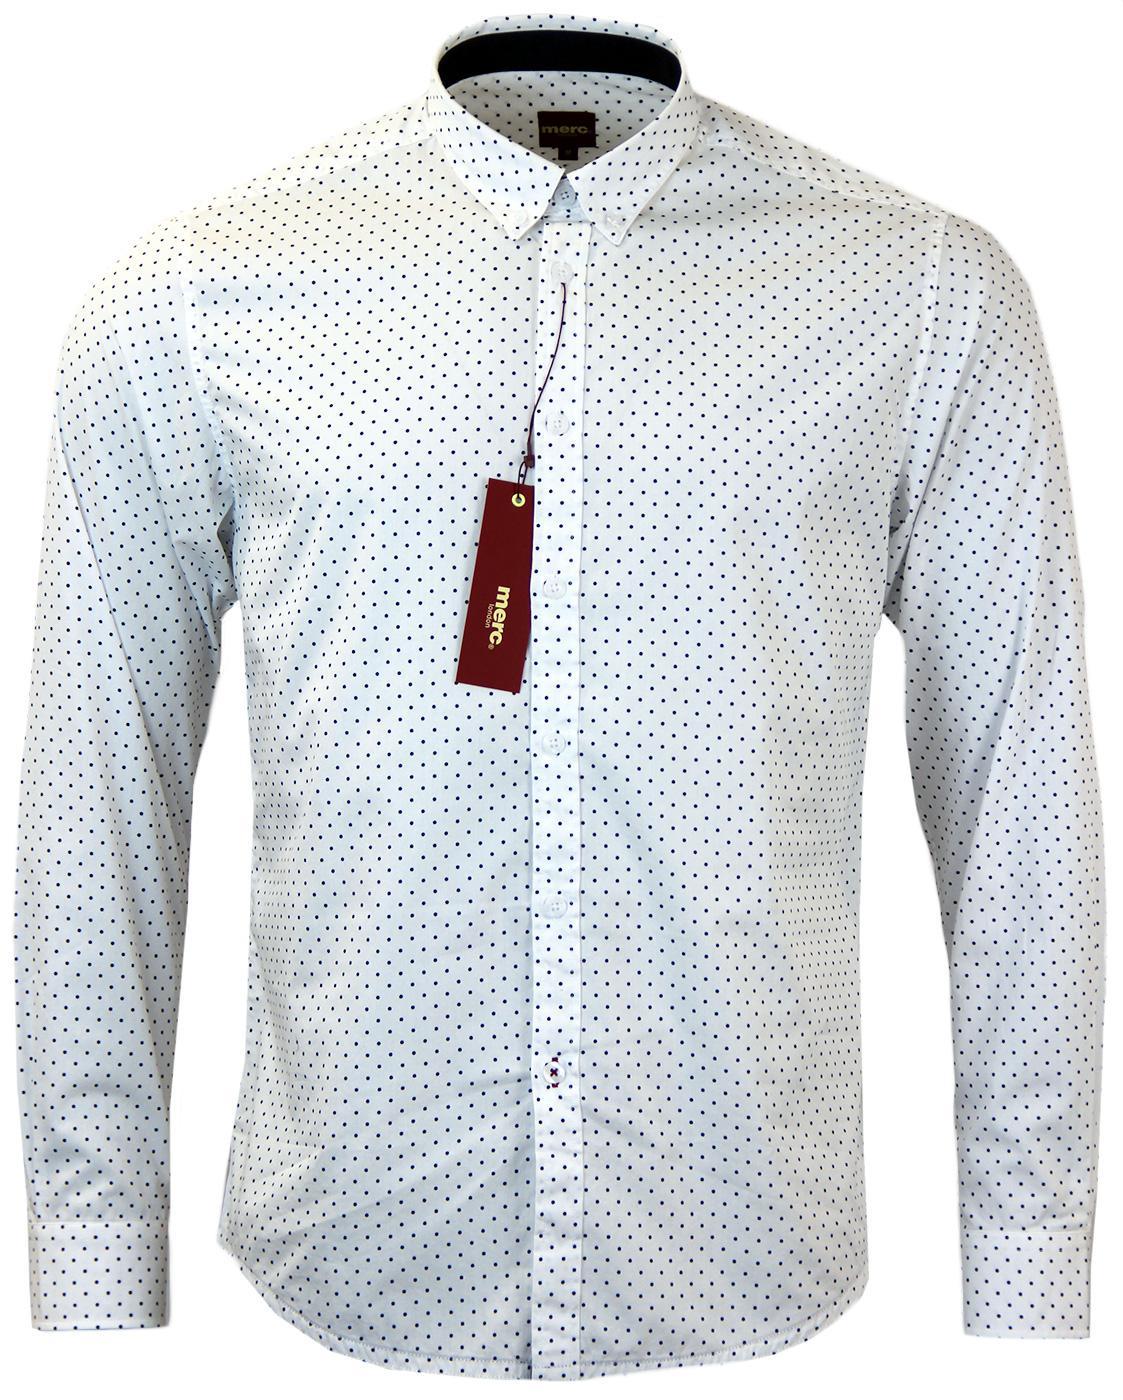 Siegel MERC Retro Sixties Polka Dot Mod Shirt W